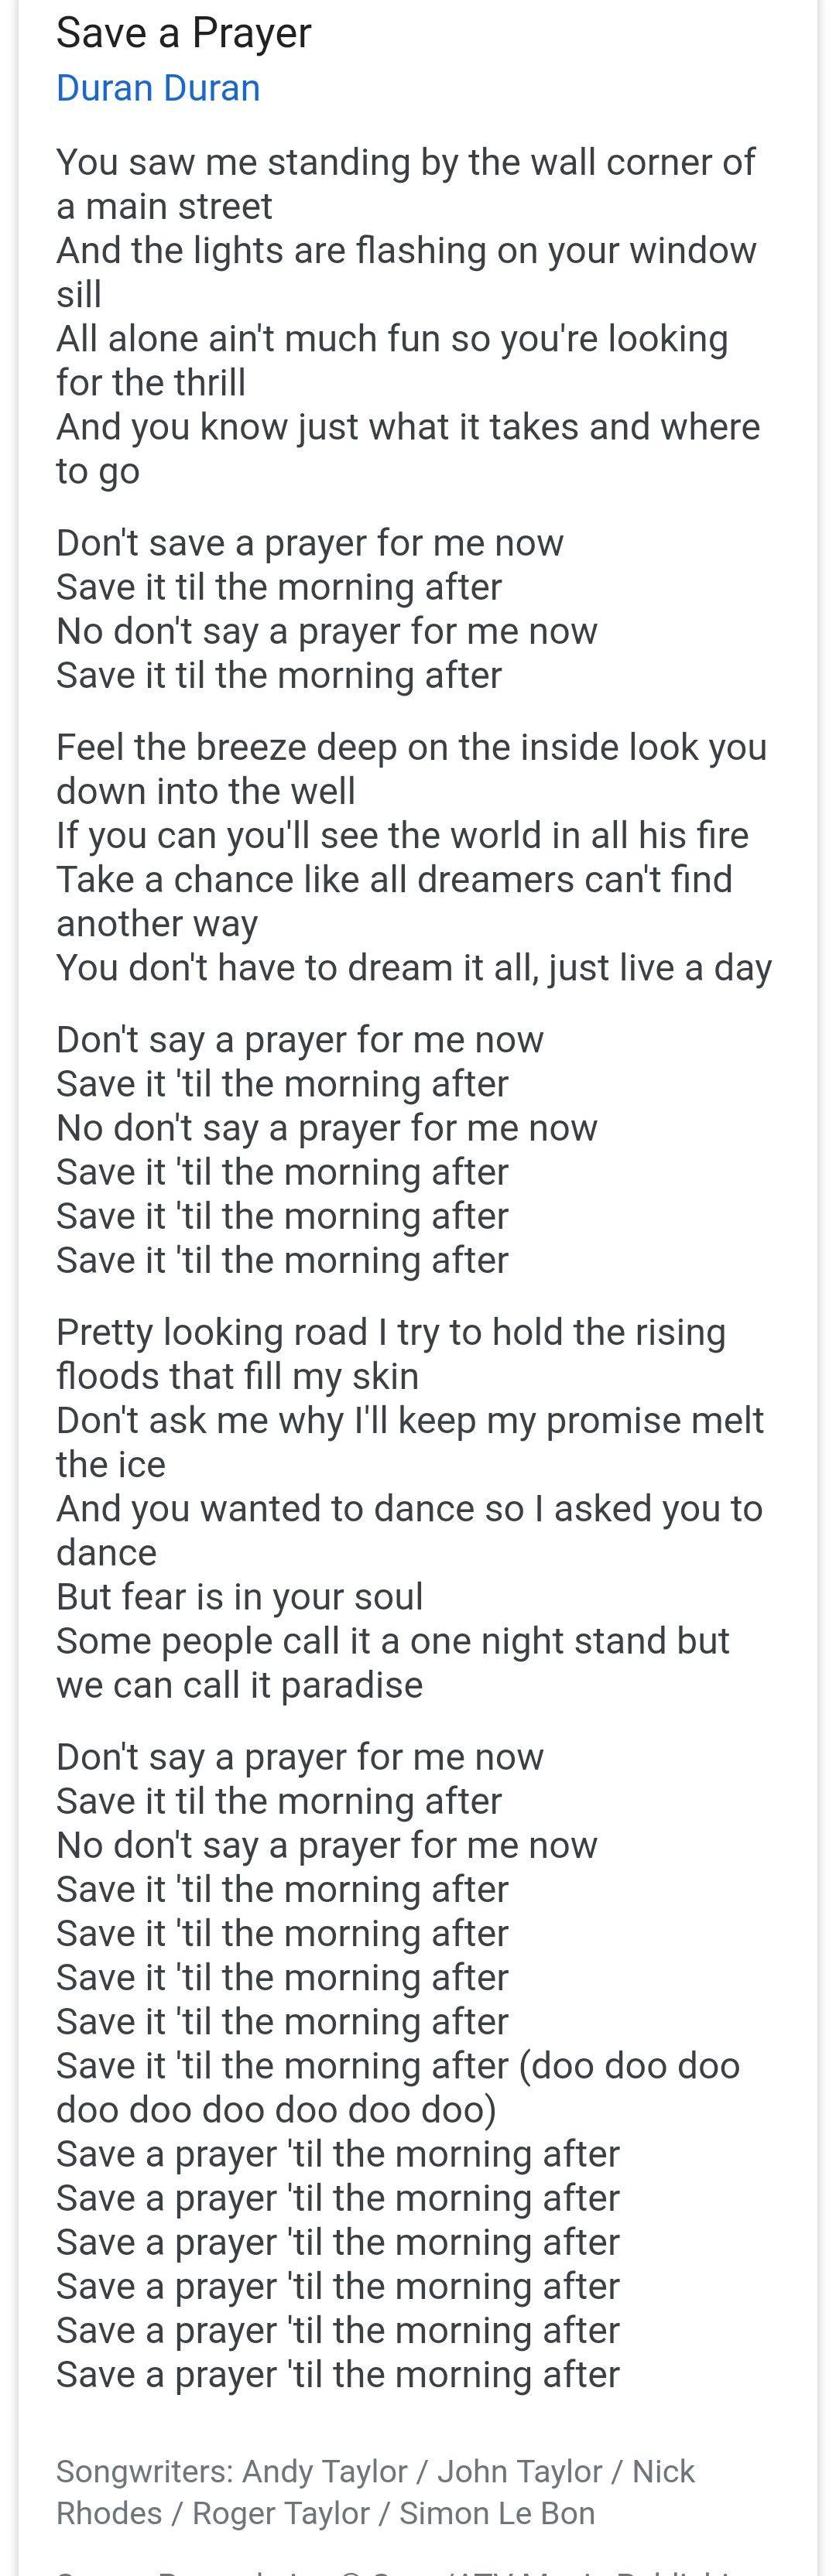 Parole Stand By Me : parole, stand, Prayer, Lyrics, Duran